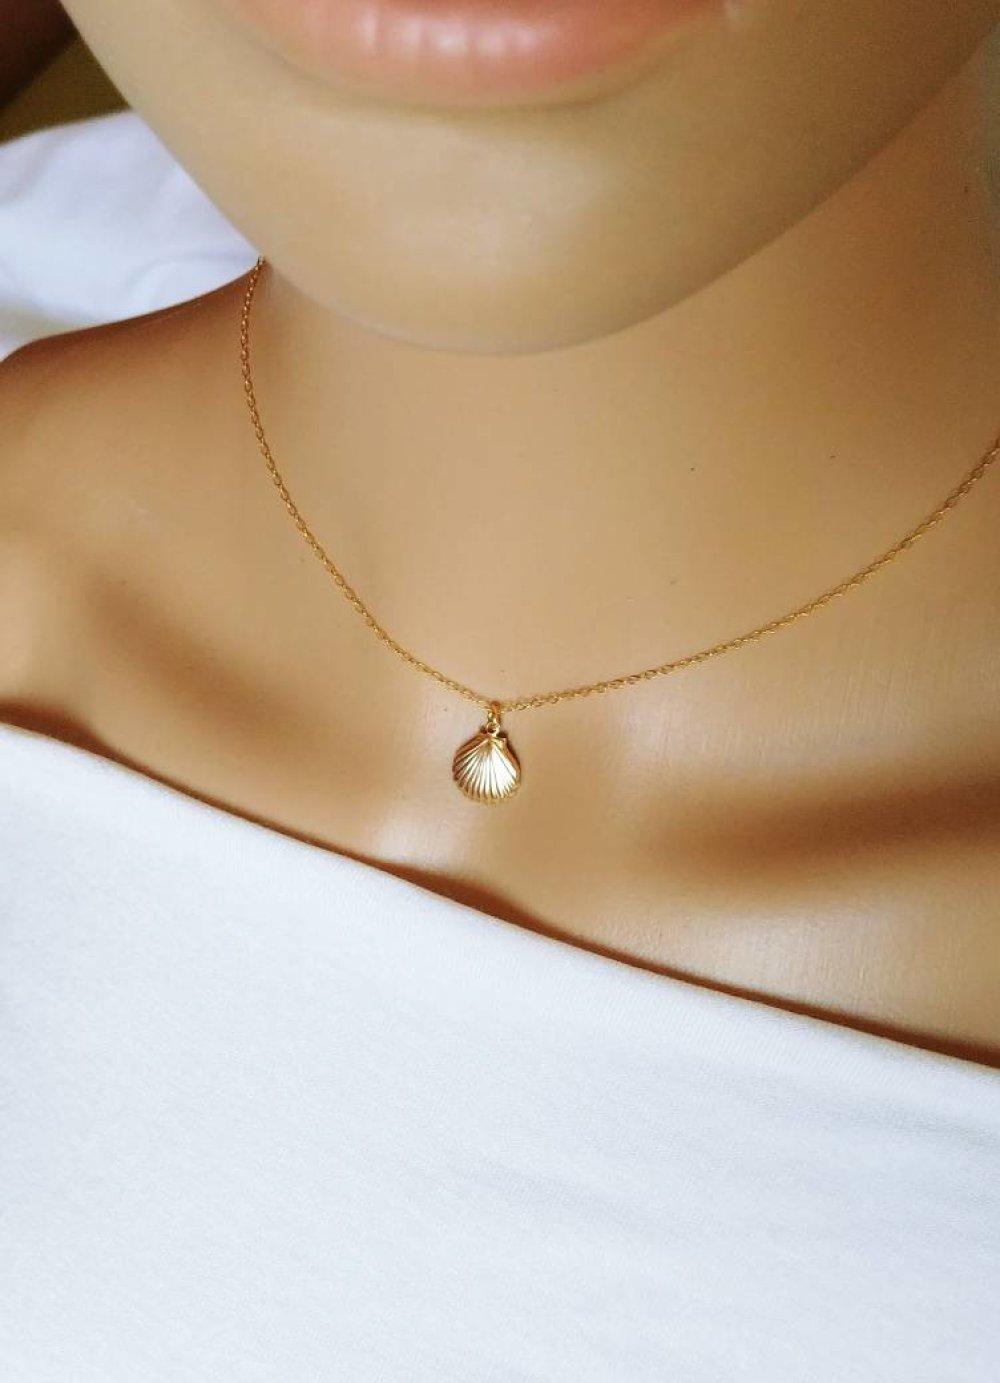 Collier coquillage, collier coquillage or, ras de cou or, collier femme, idée cadeau femme